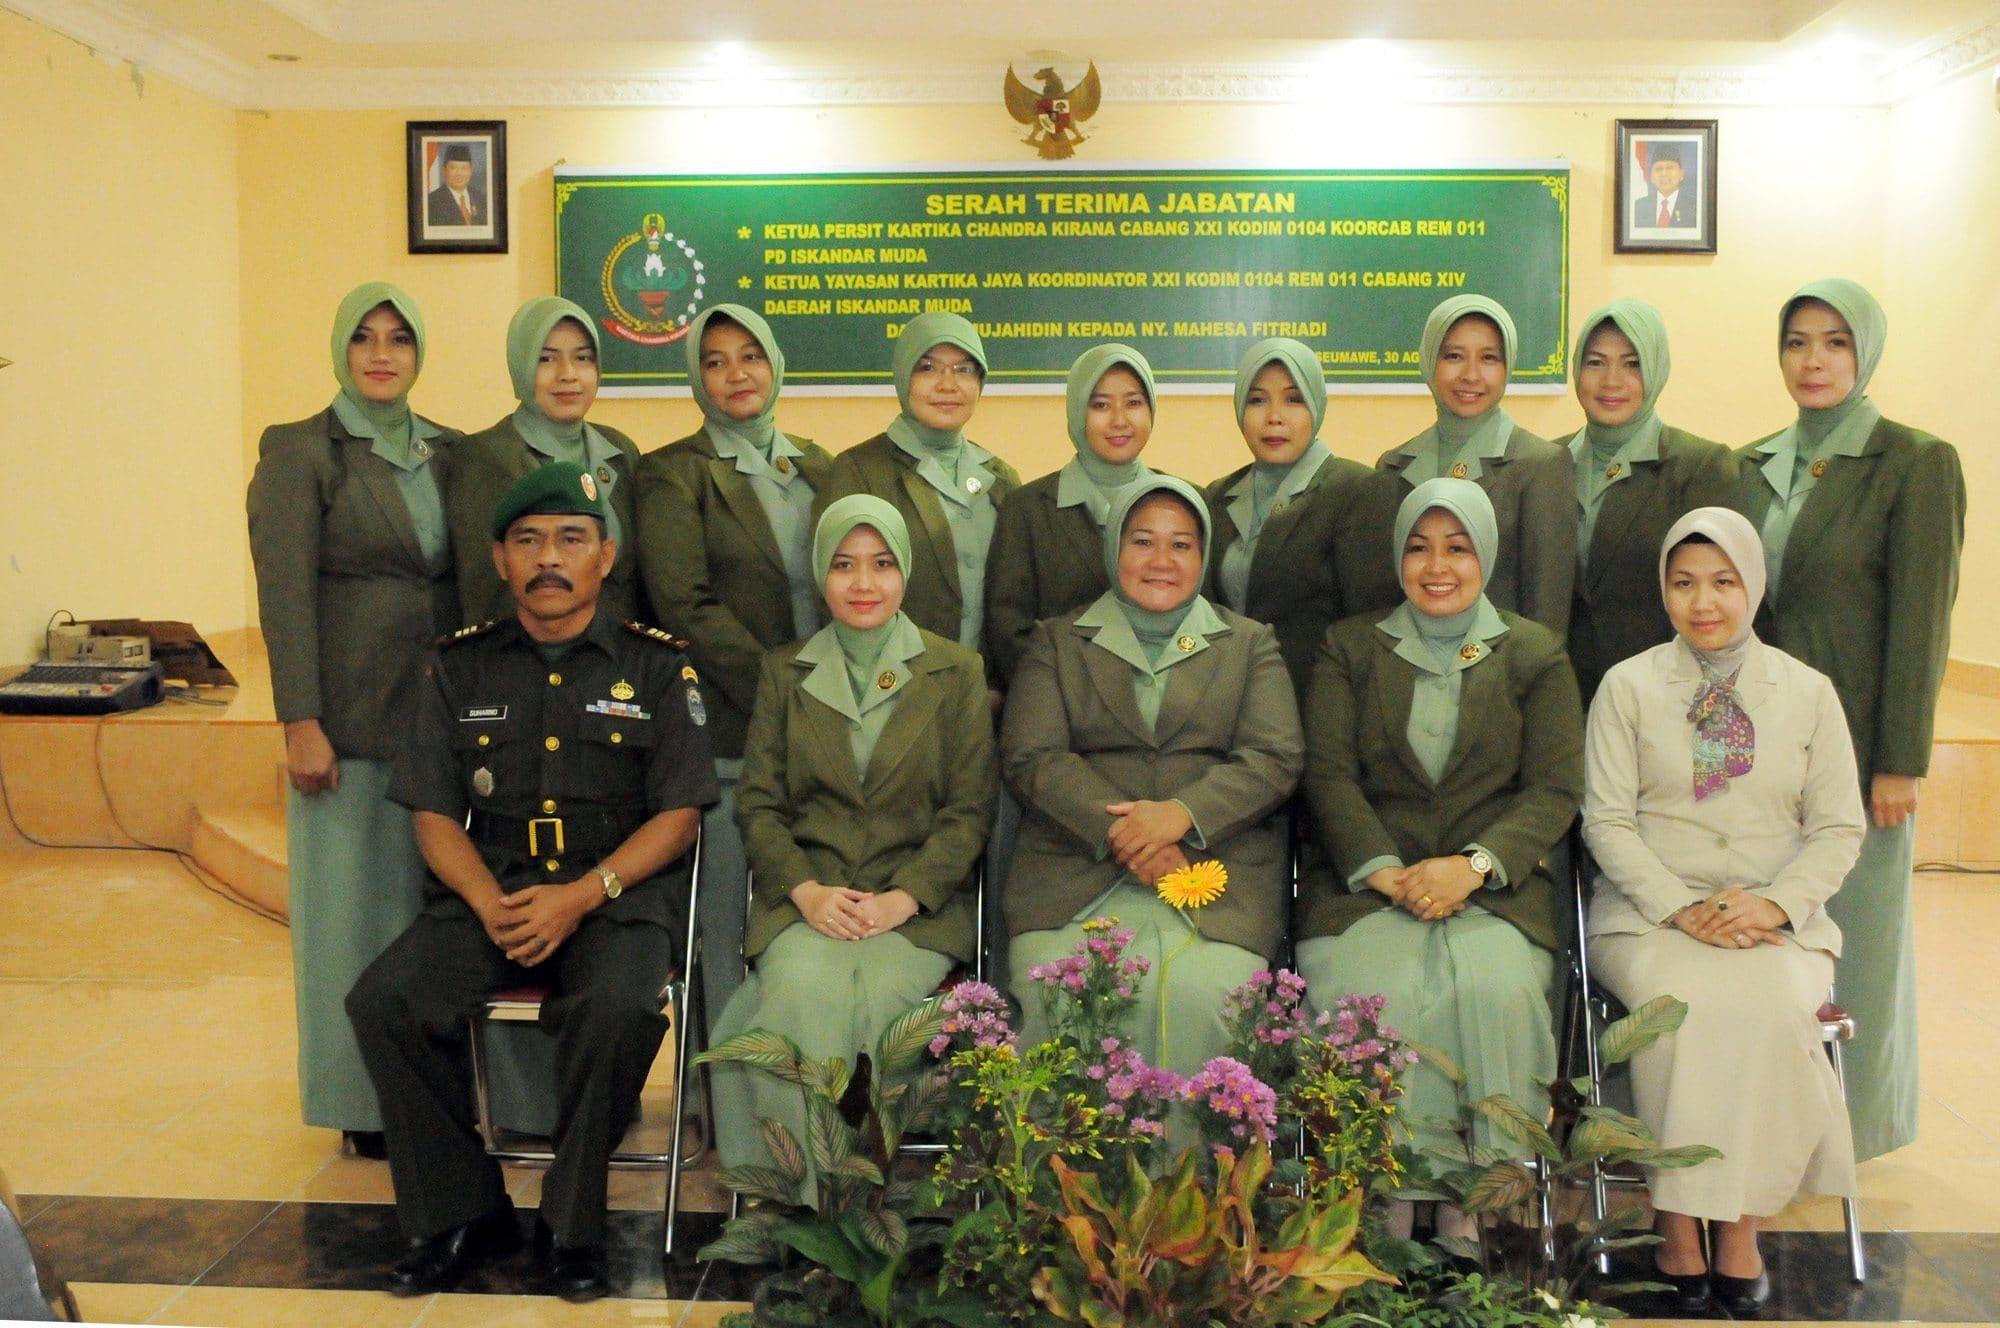 Ny Ira Hipdizah, Pimpin Serah Terima Jabatan Ketua Persit Kartika Chandra Kirana Cabang XXI Kodim 0104 Aceh Timur